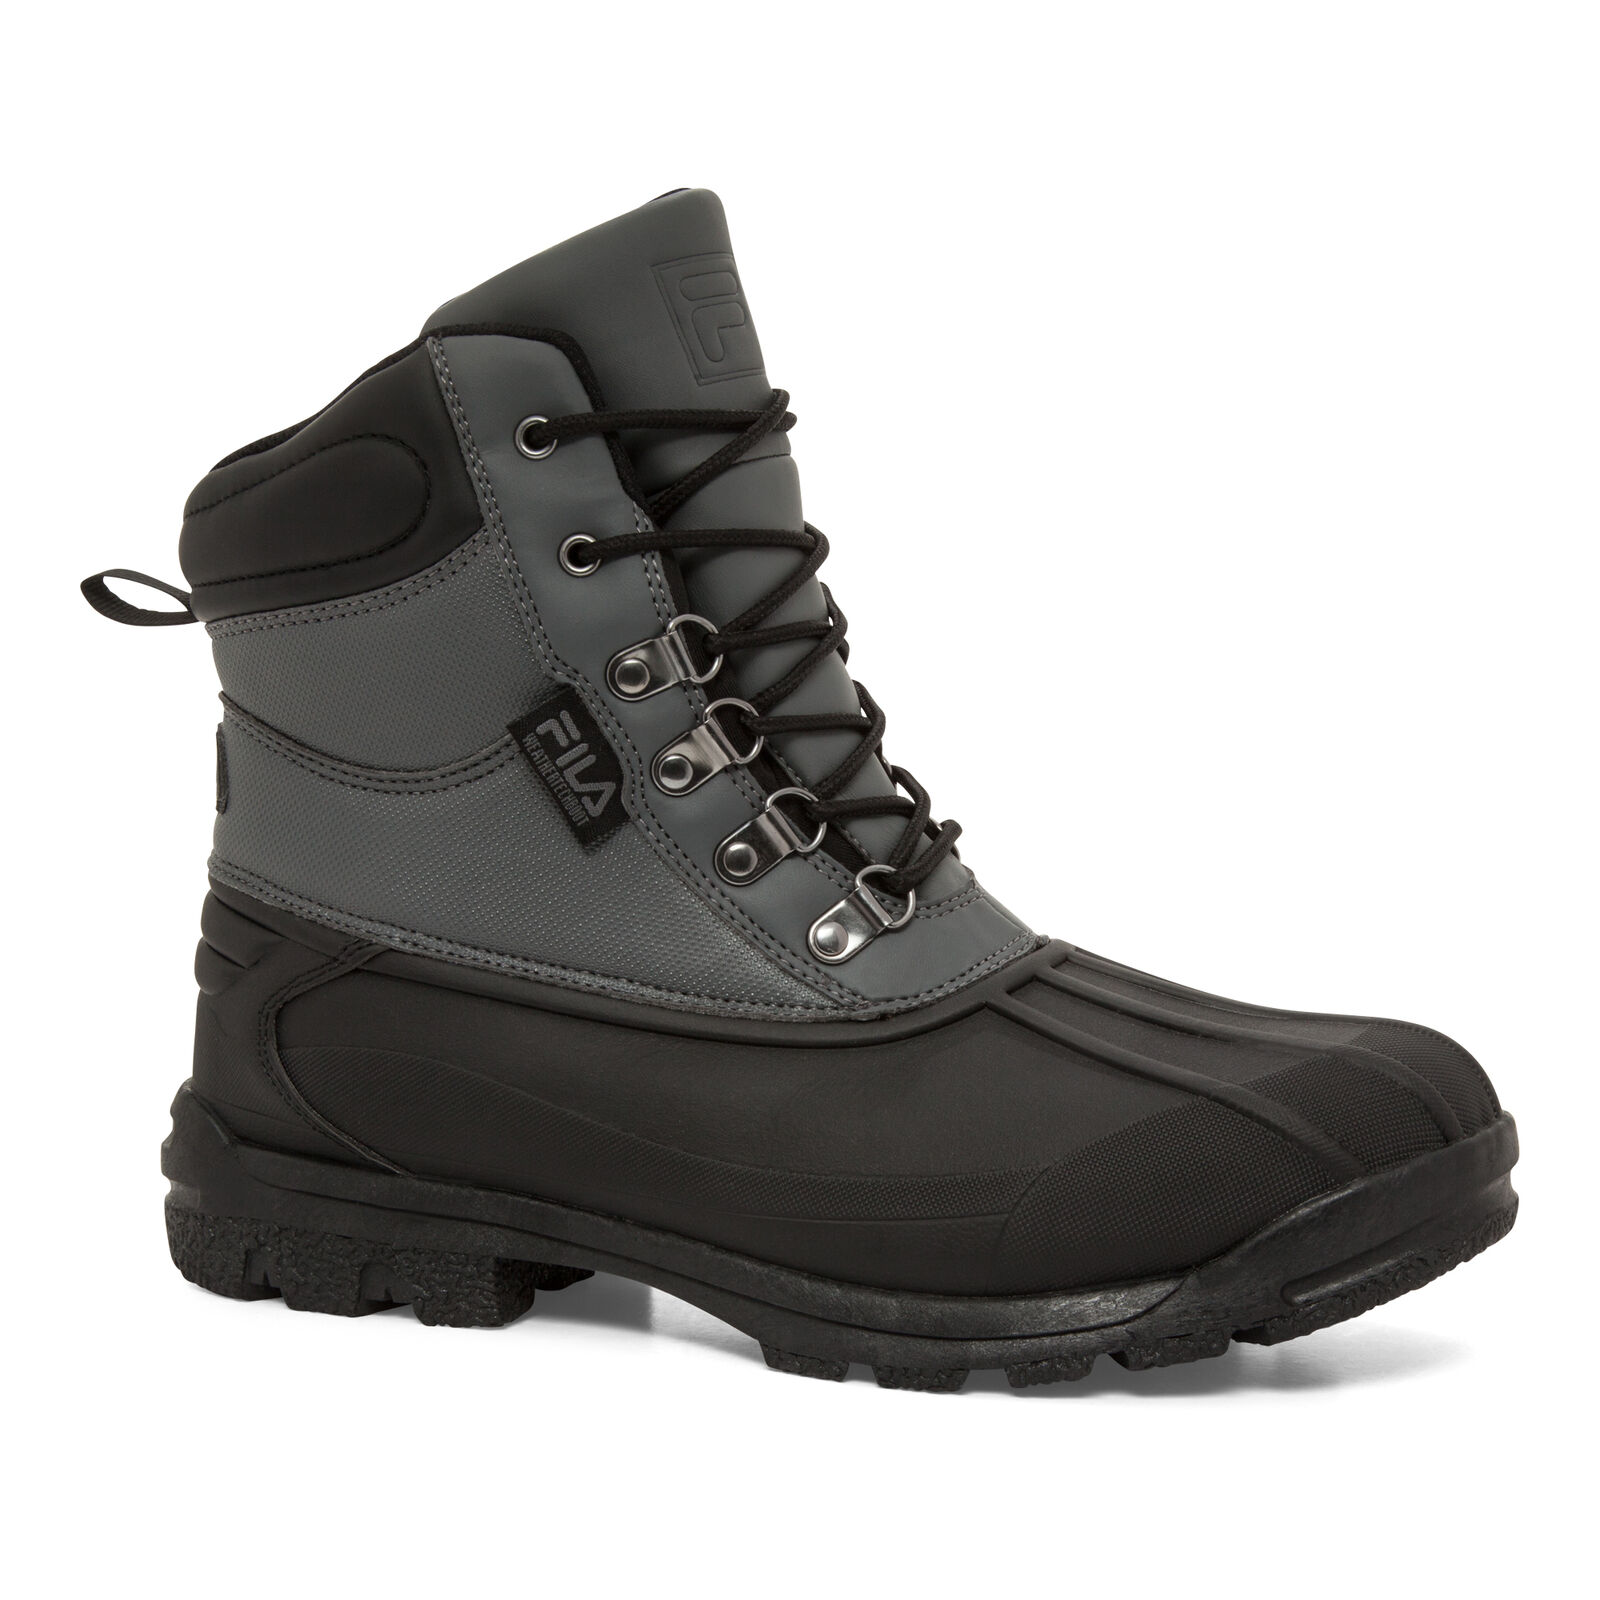 Fila Men's WeatherTech Extreme Waterproof Boot